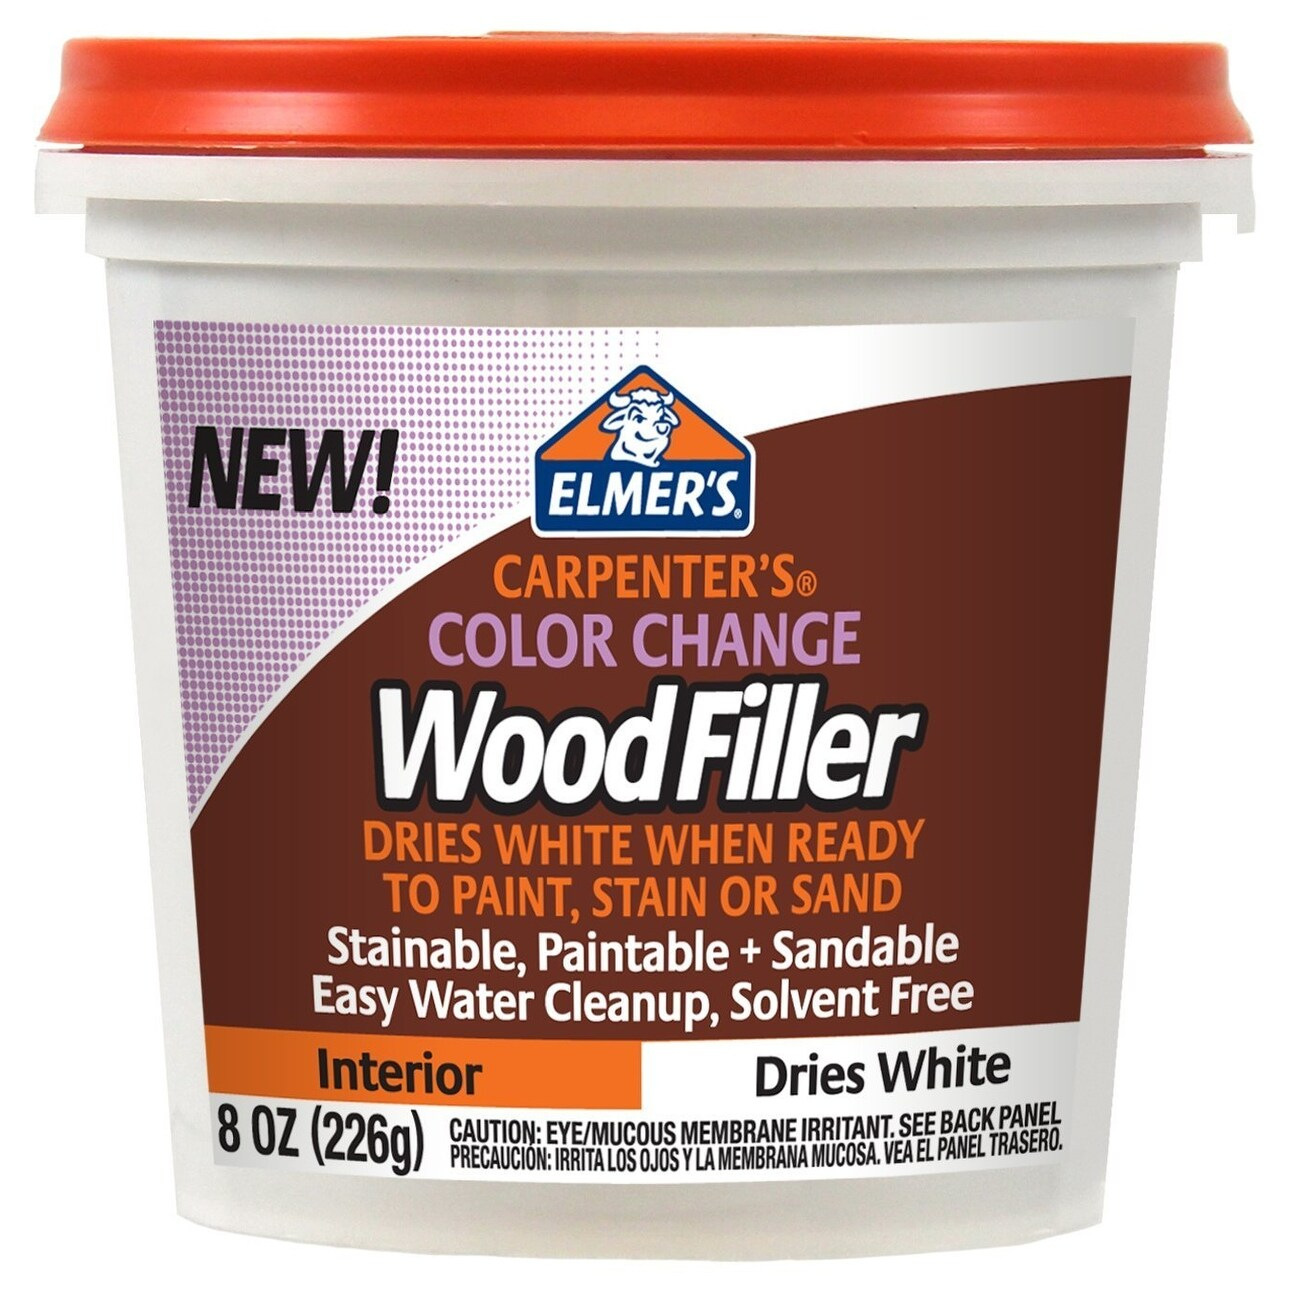 Elmers E916 Carpenters Color Change Interior Wood Filler, Dries White, 8 Oz